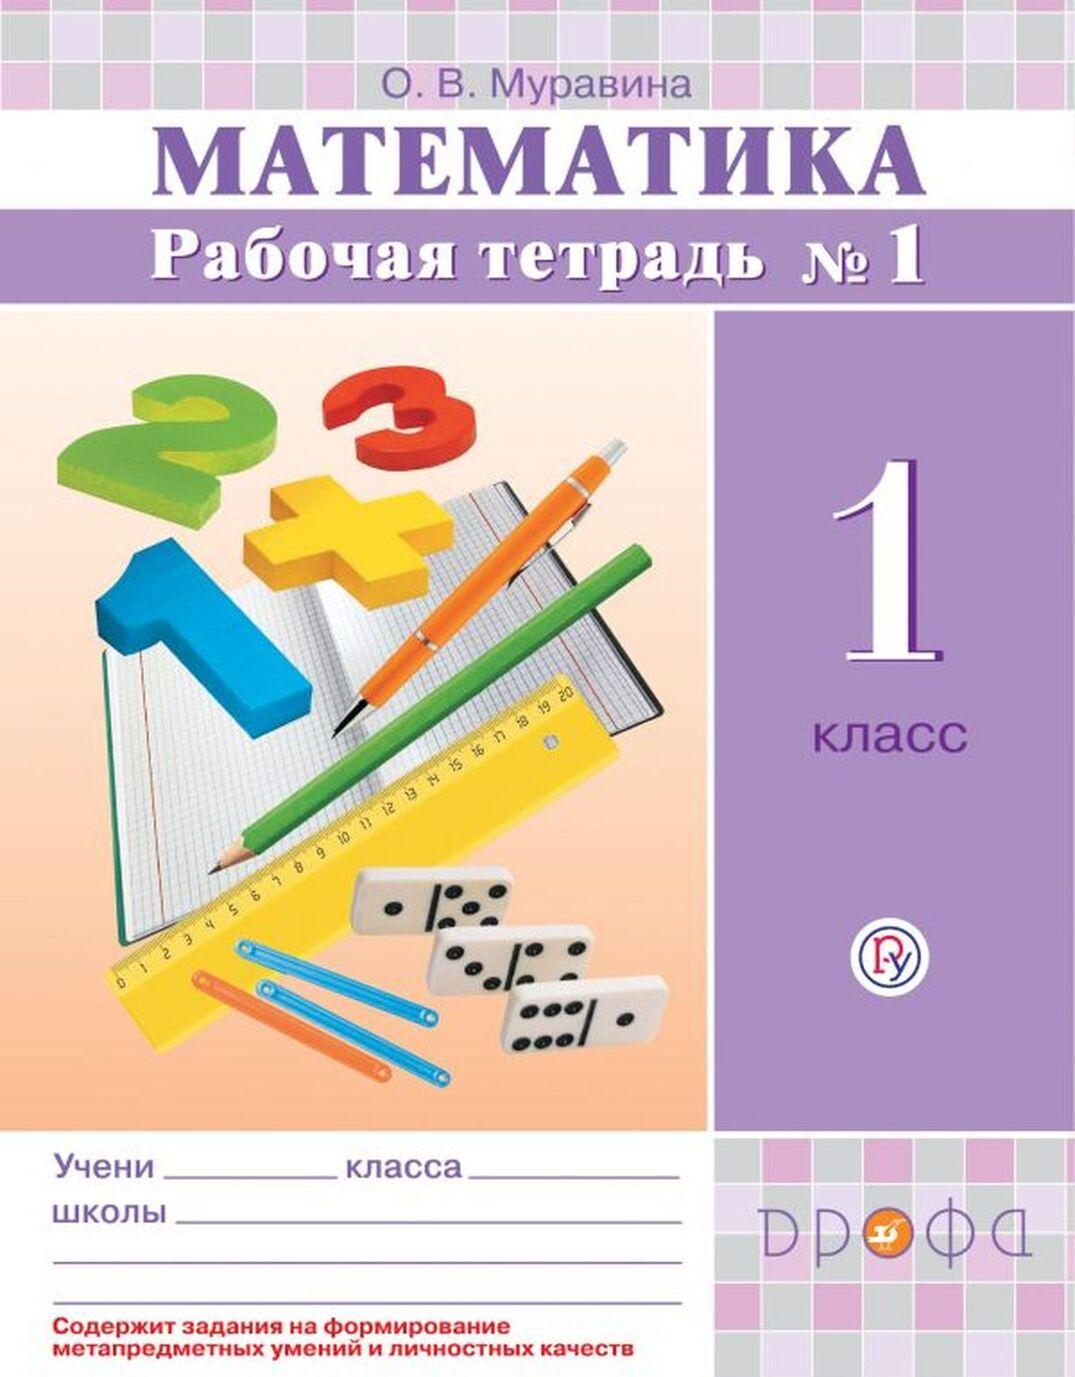 Matematika. 1 klass. Rabochaja tetrad № 1